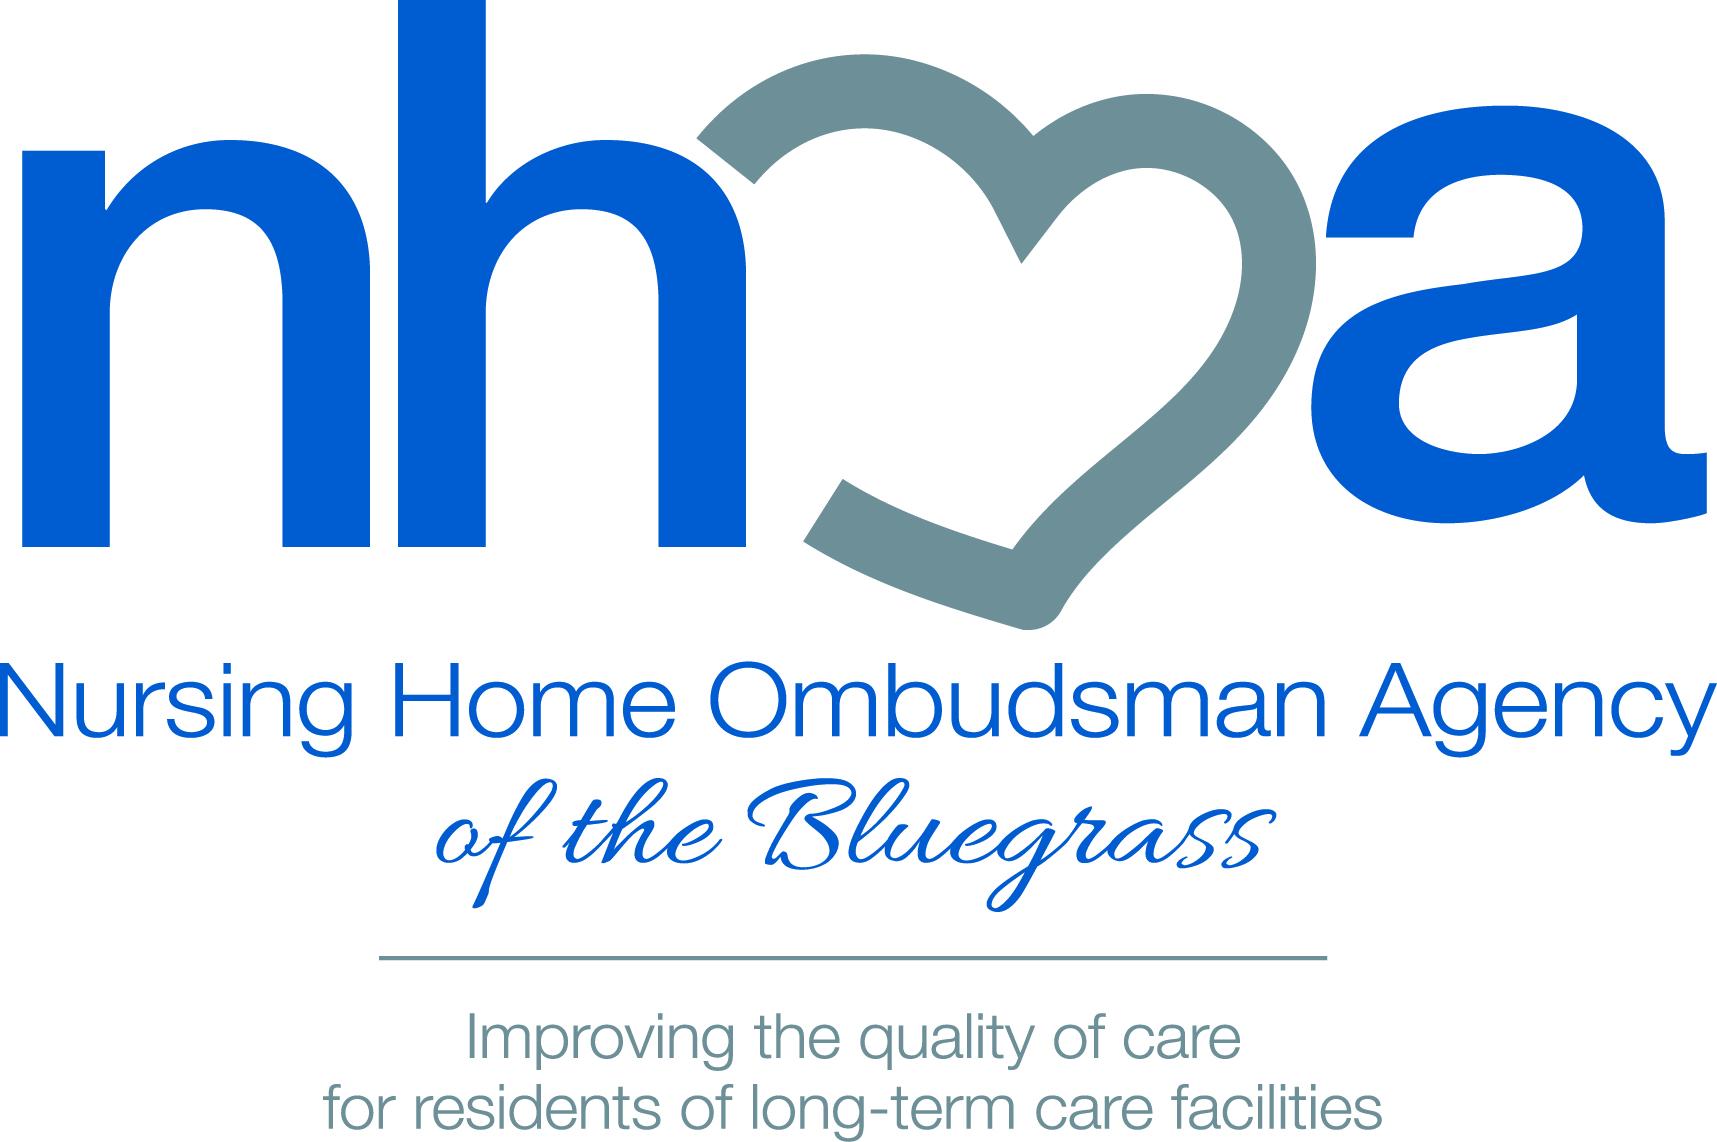 Nursing Home Ombudsman Agency